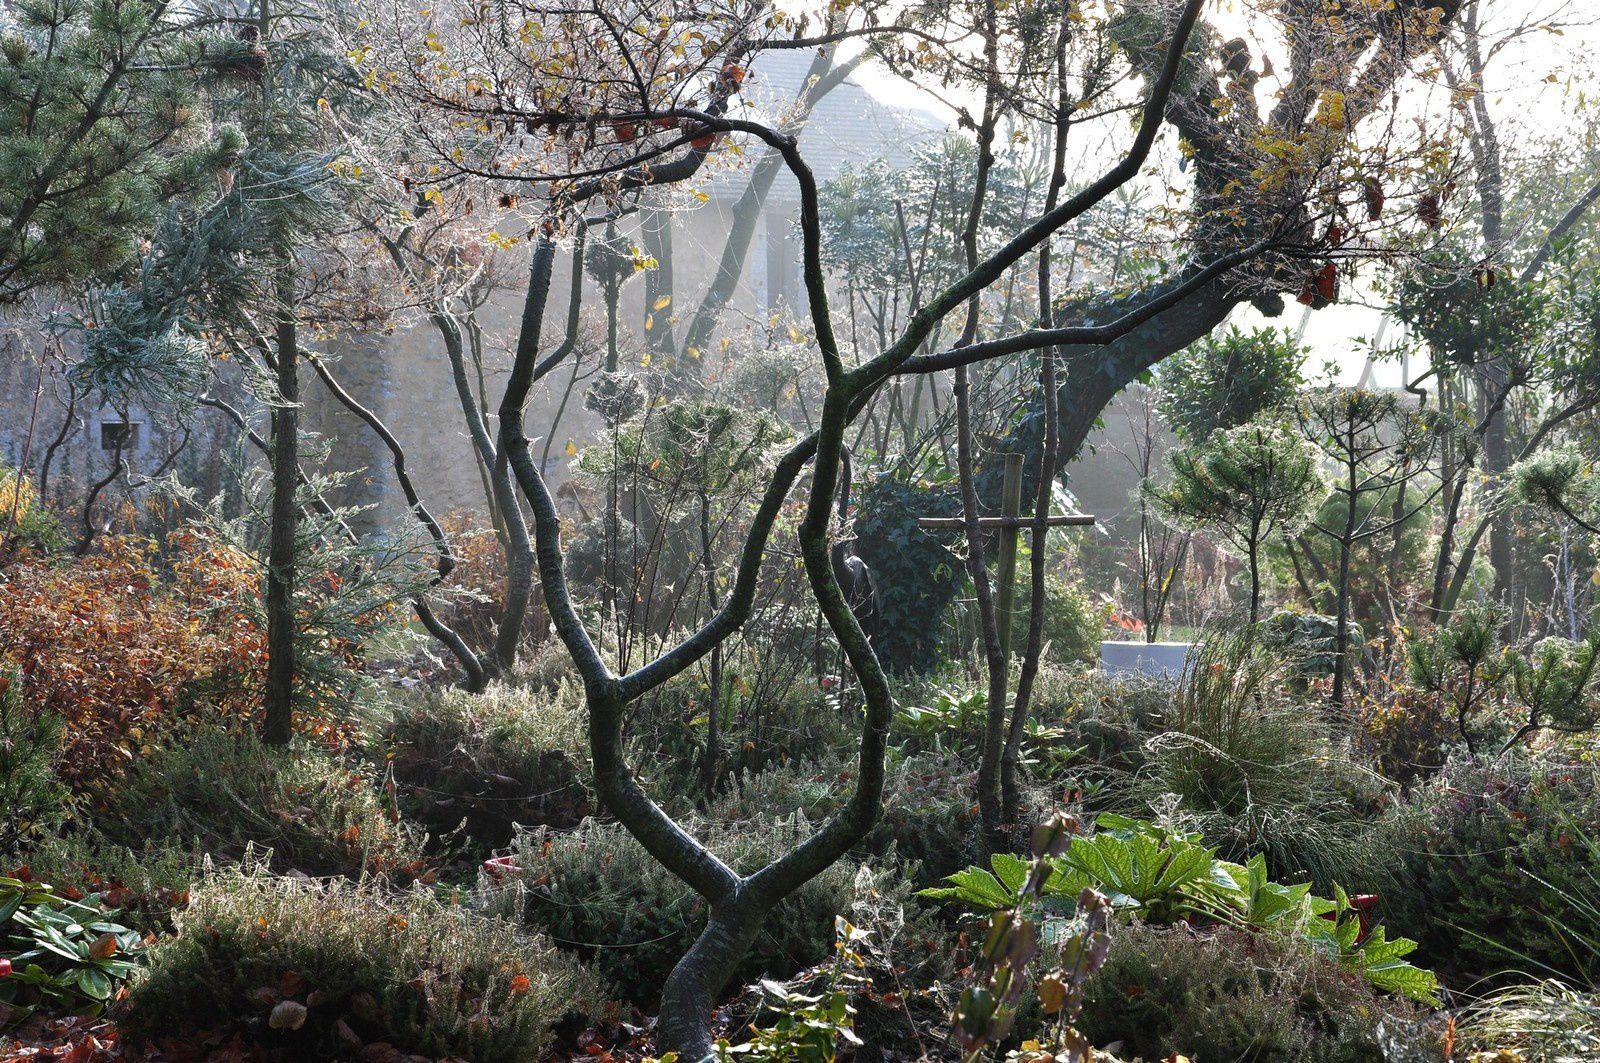 Le jardin s'embrume